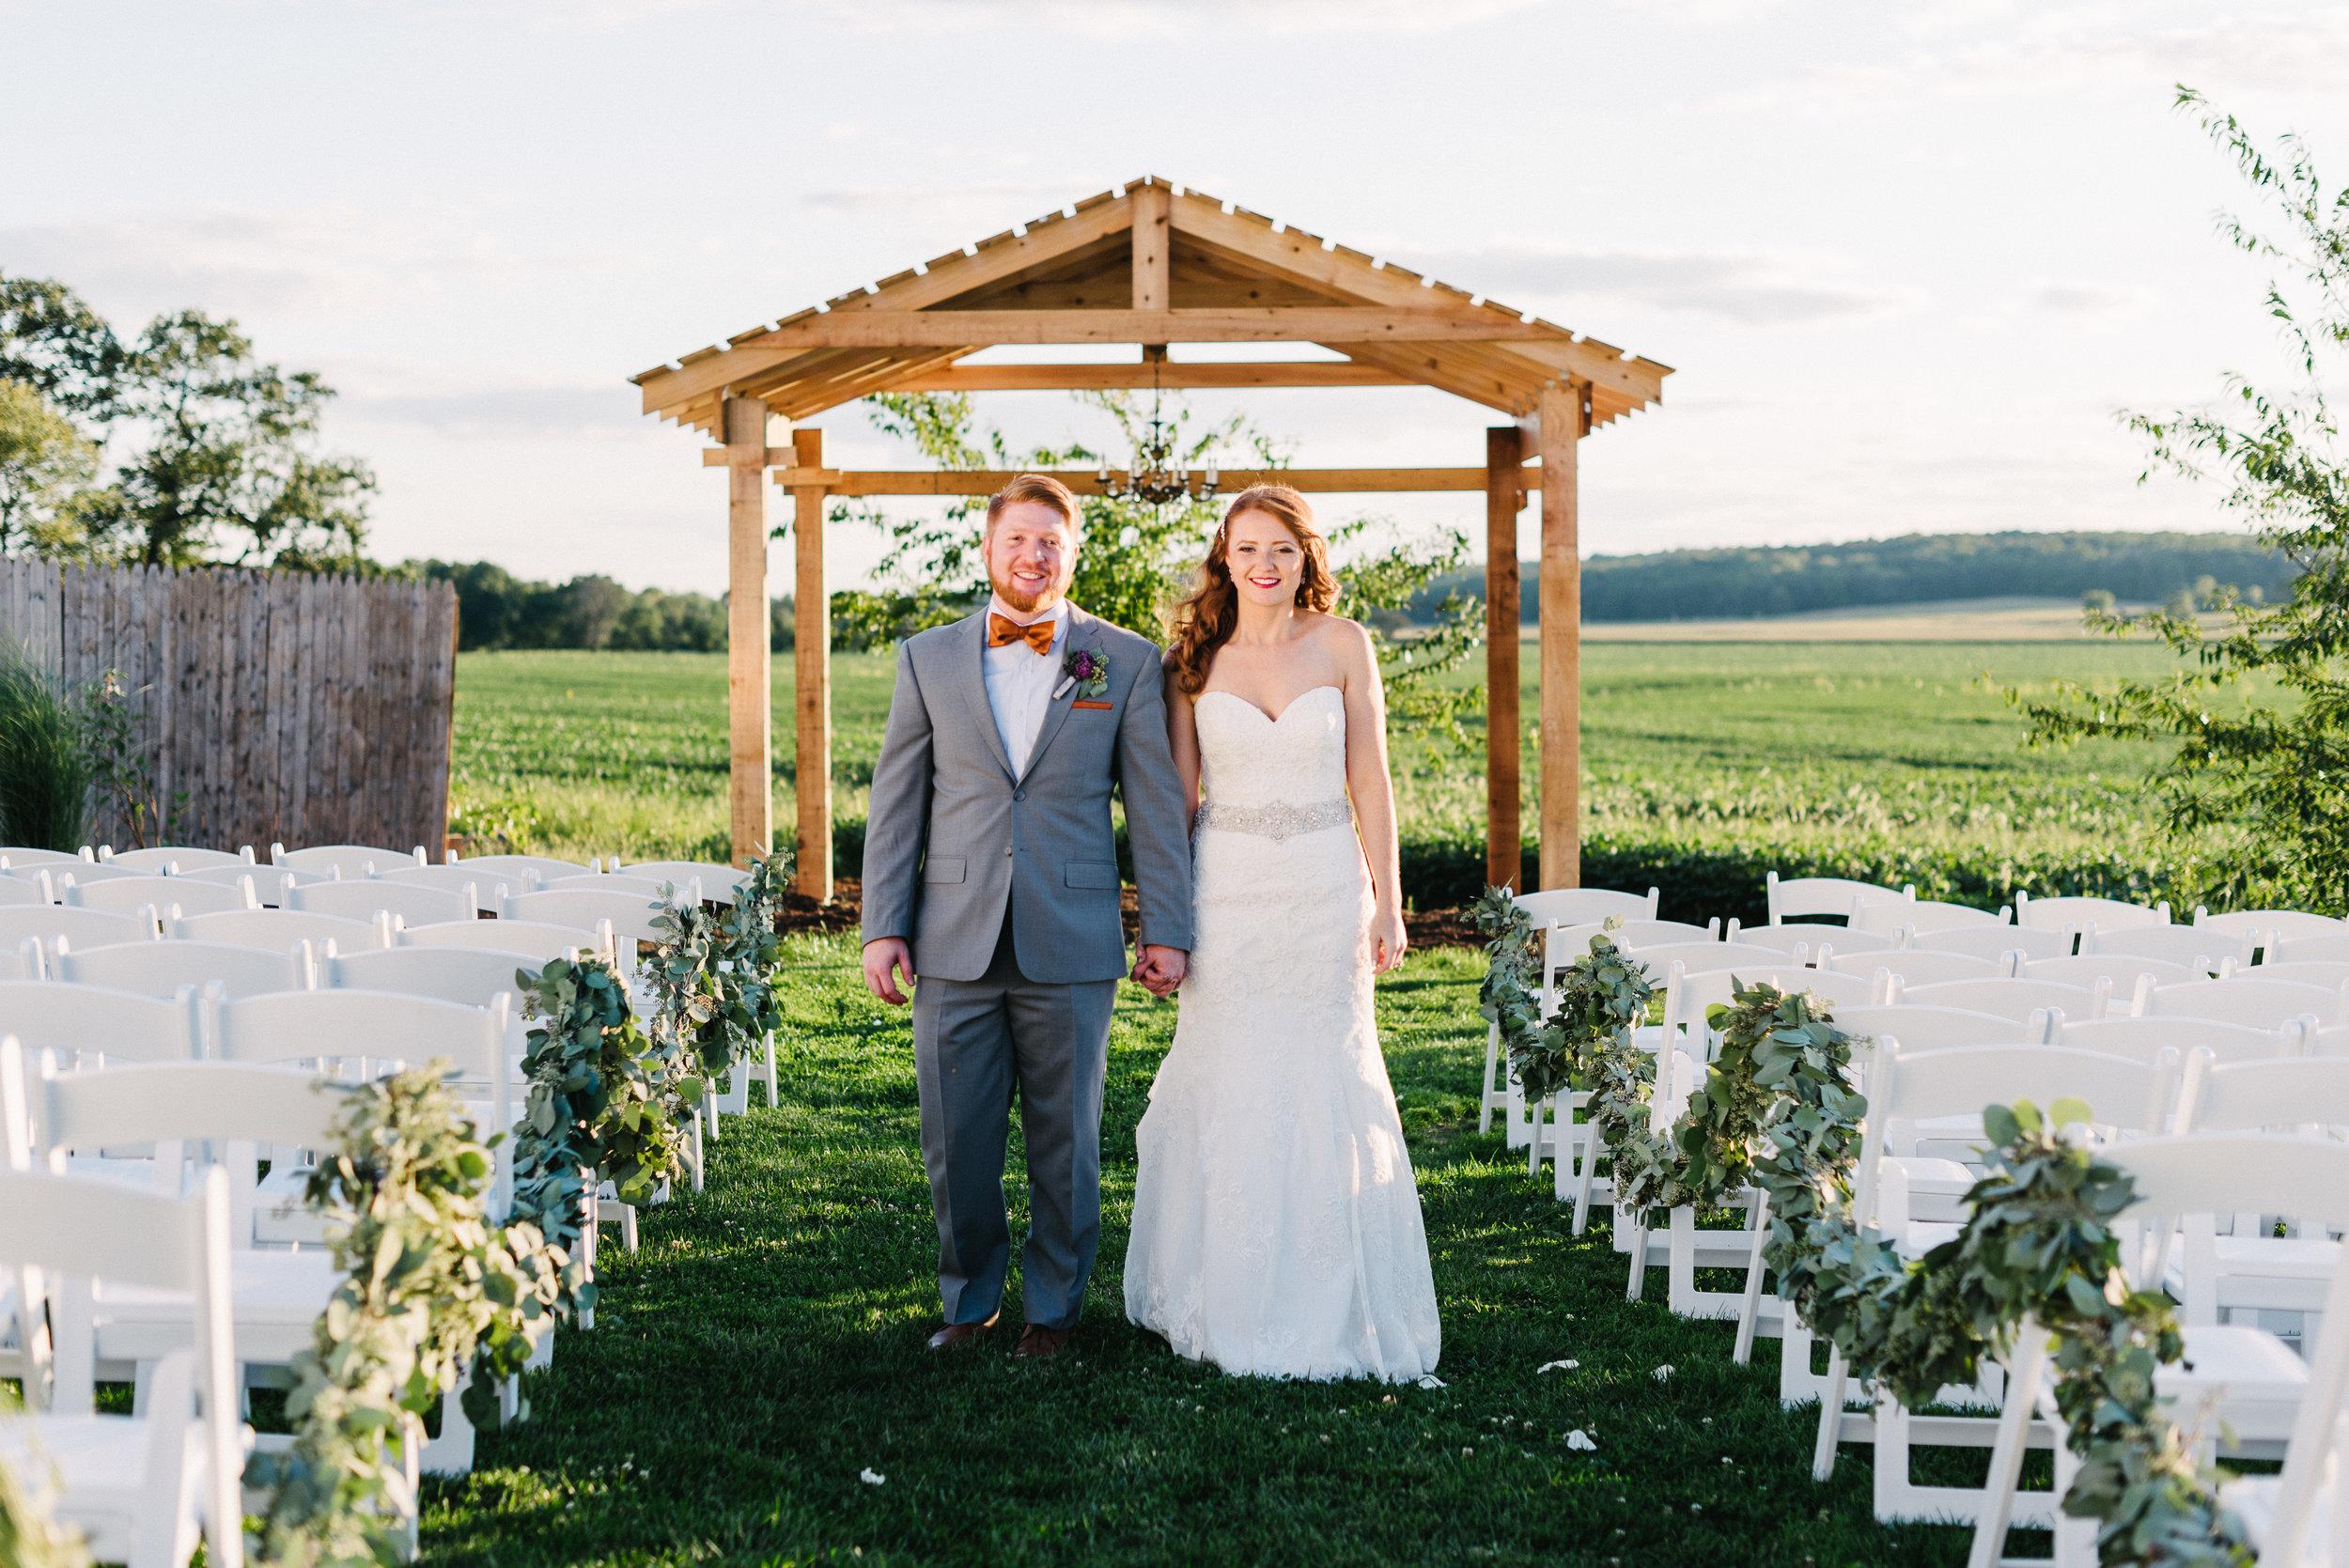 stephanie-cody-wedding_TSP-183206.jpg